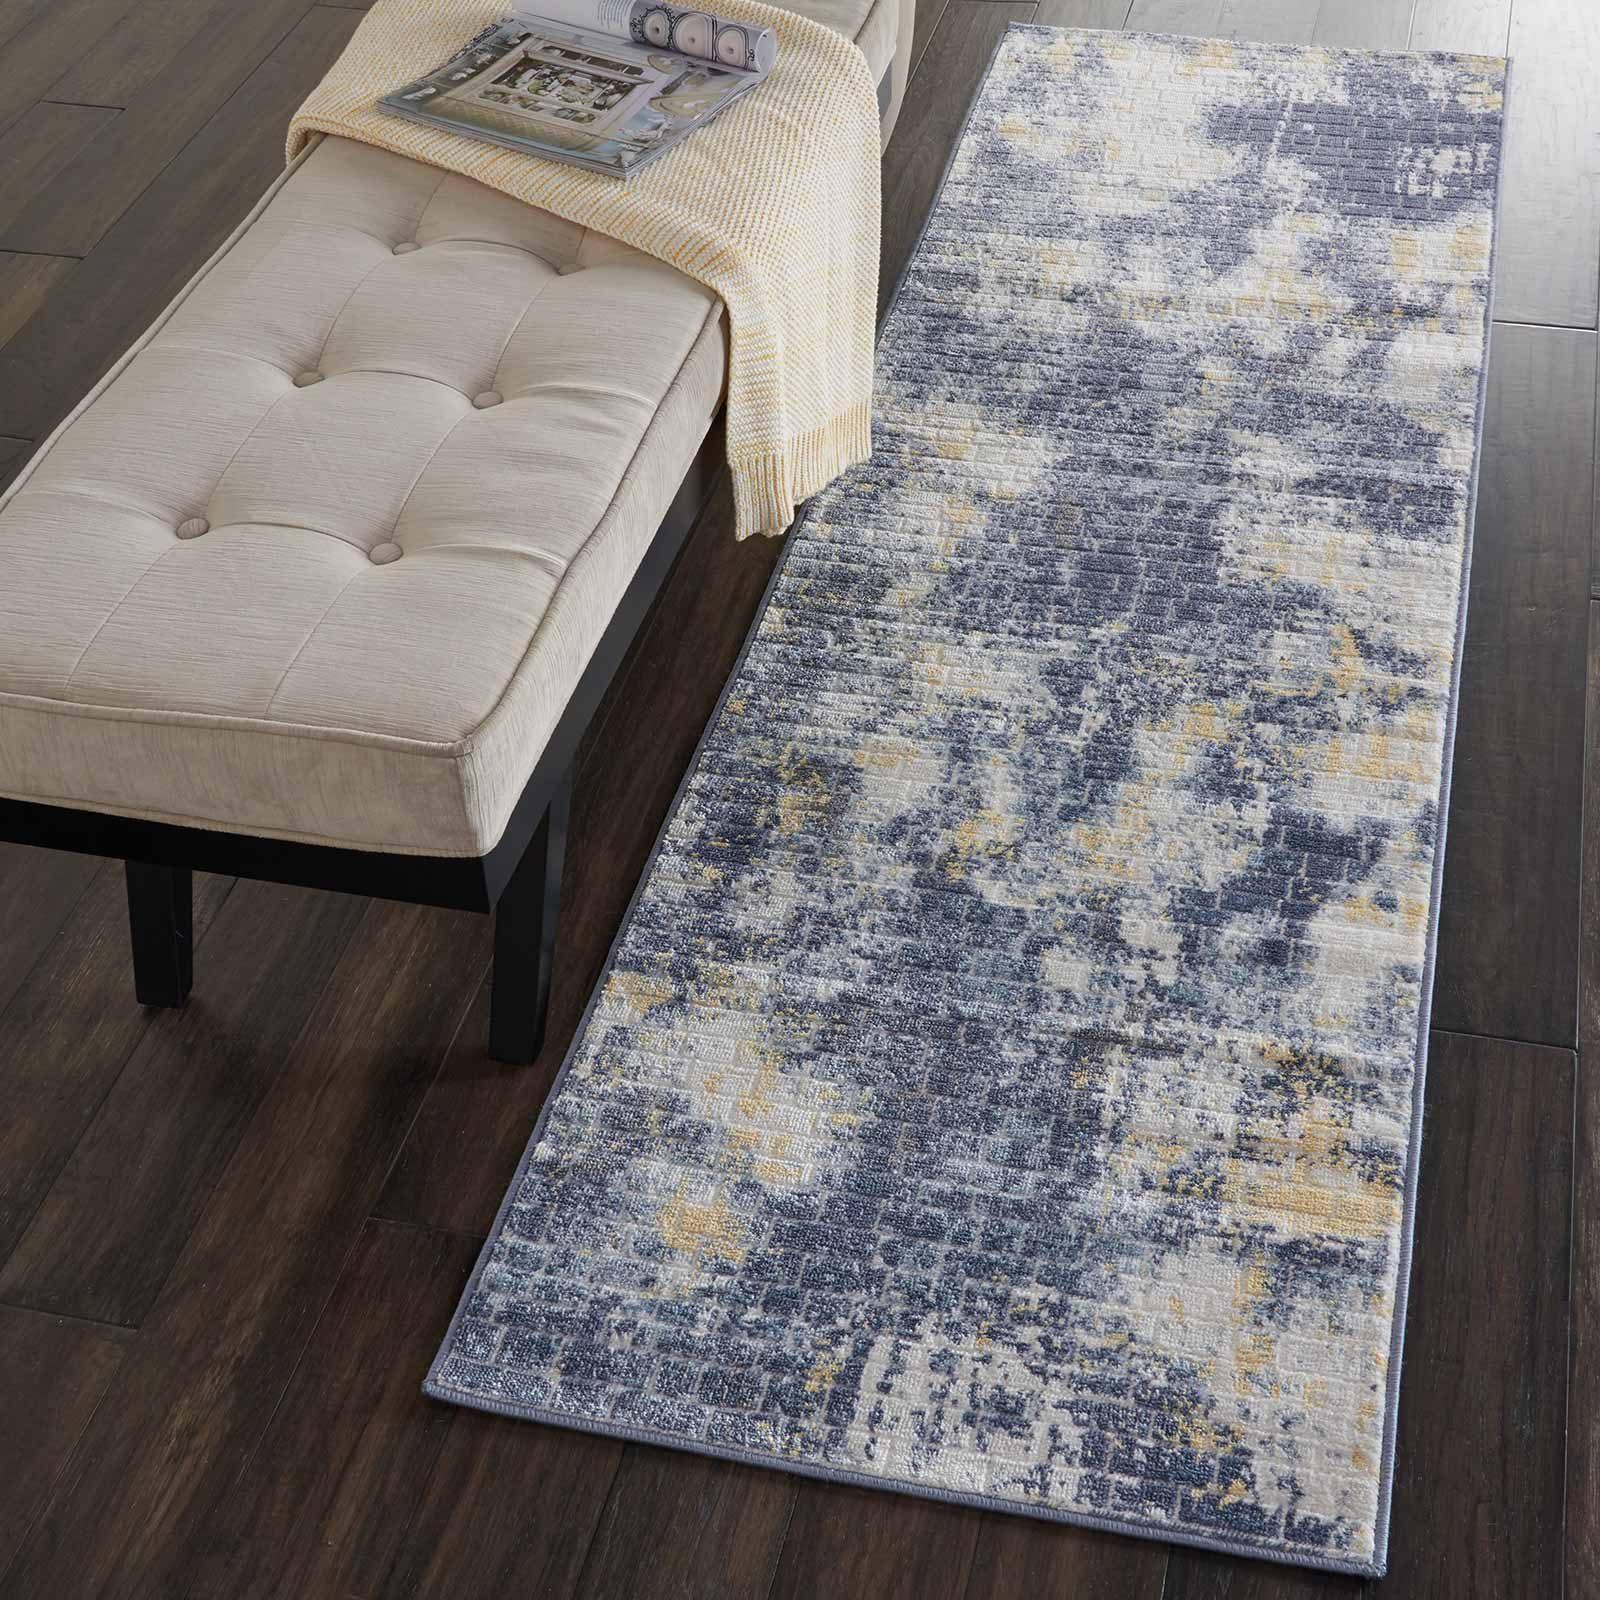 Nourison rug Urban Decor URD05 IVSKY 2X8 099446467164 interior 1 C